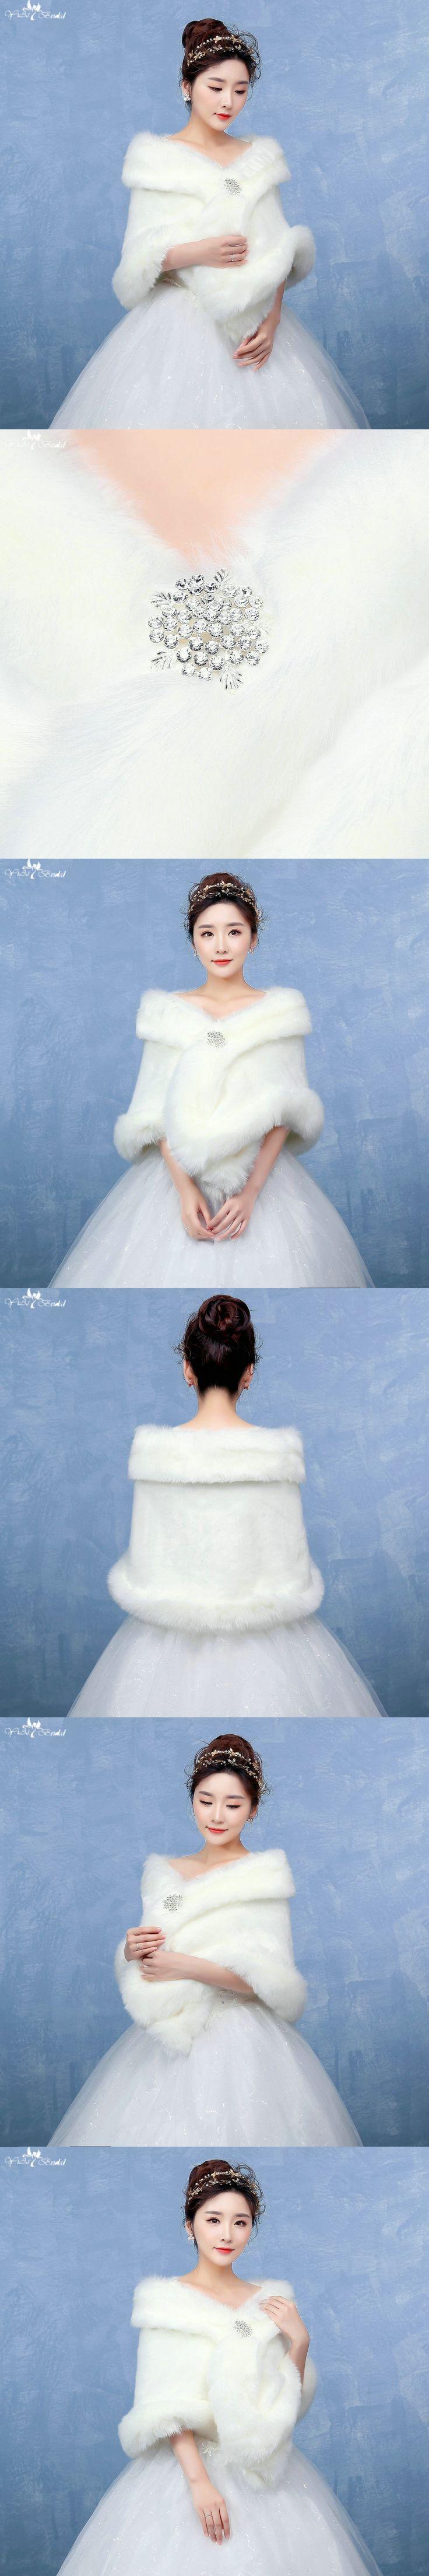 LZP126 Simple Off Shoulder Elegant Waterproof Wedding Fur Bolero Women Off White Wedding Shawl